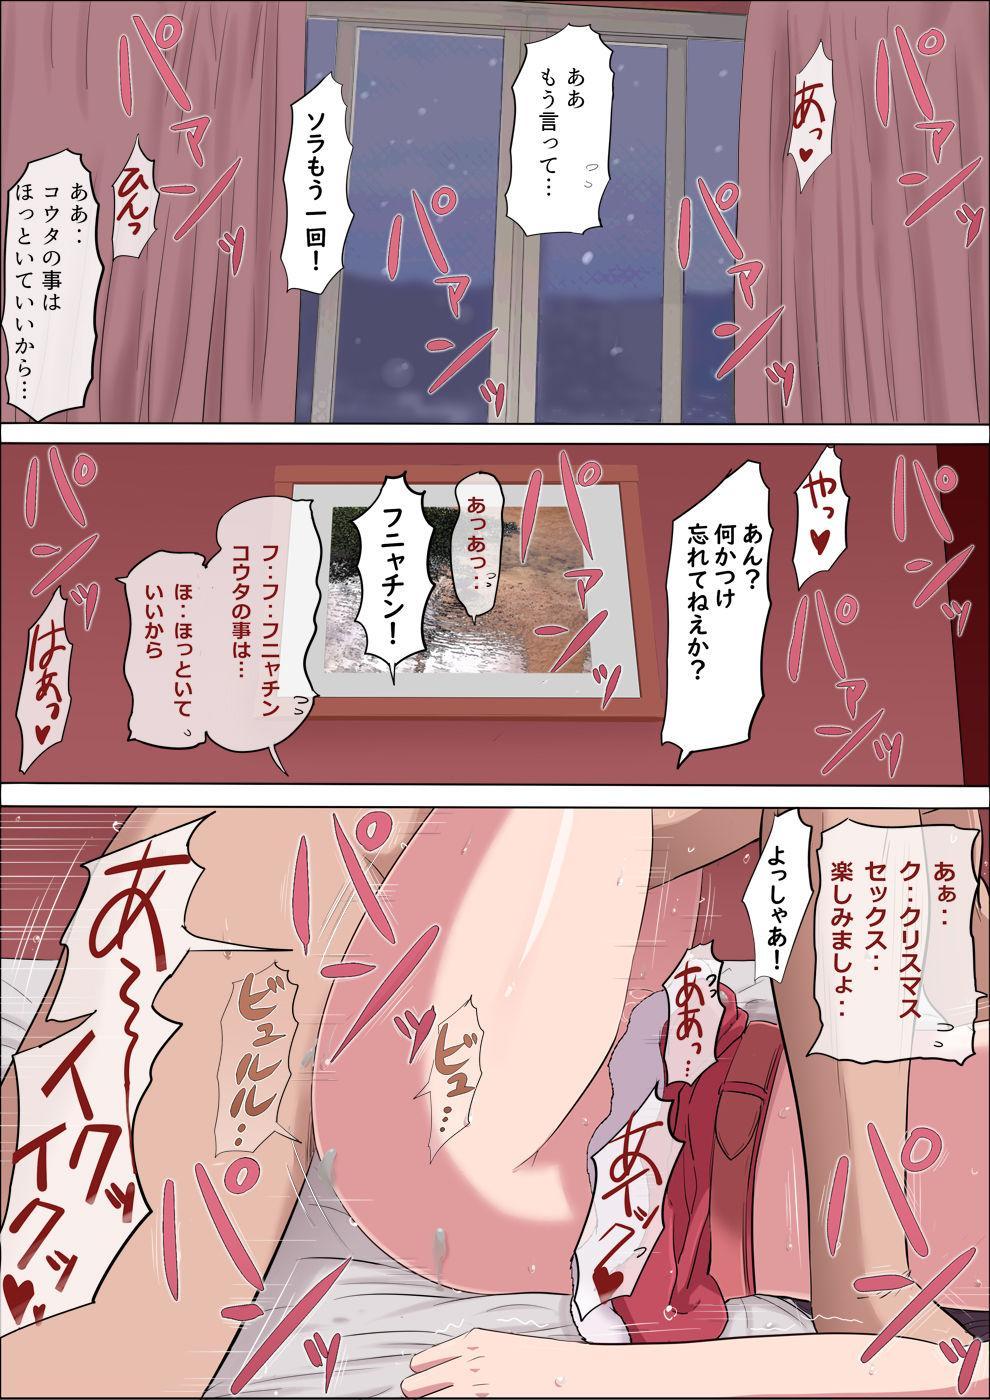 [Cotton house] Aya Nee ~Ubawareta Osananajimi~ 3 80